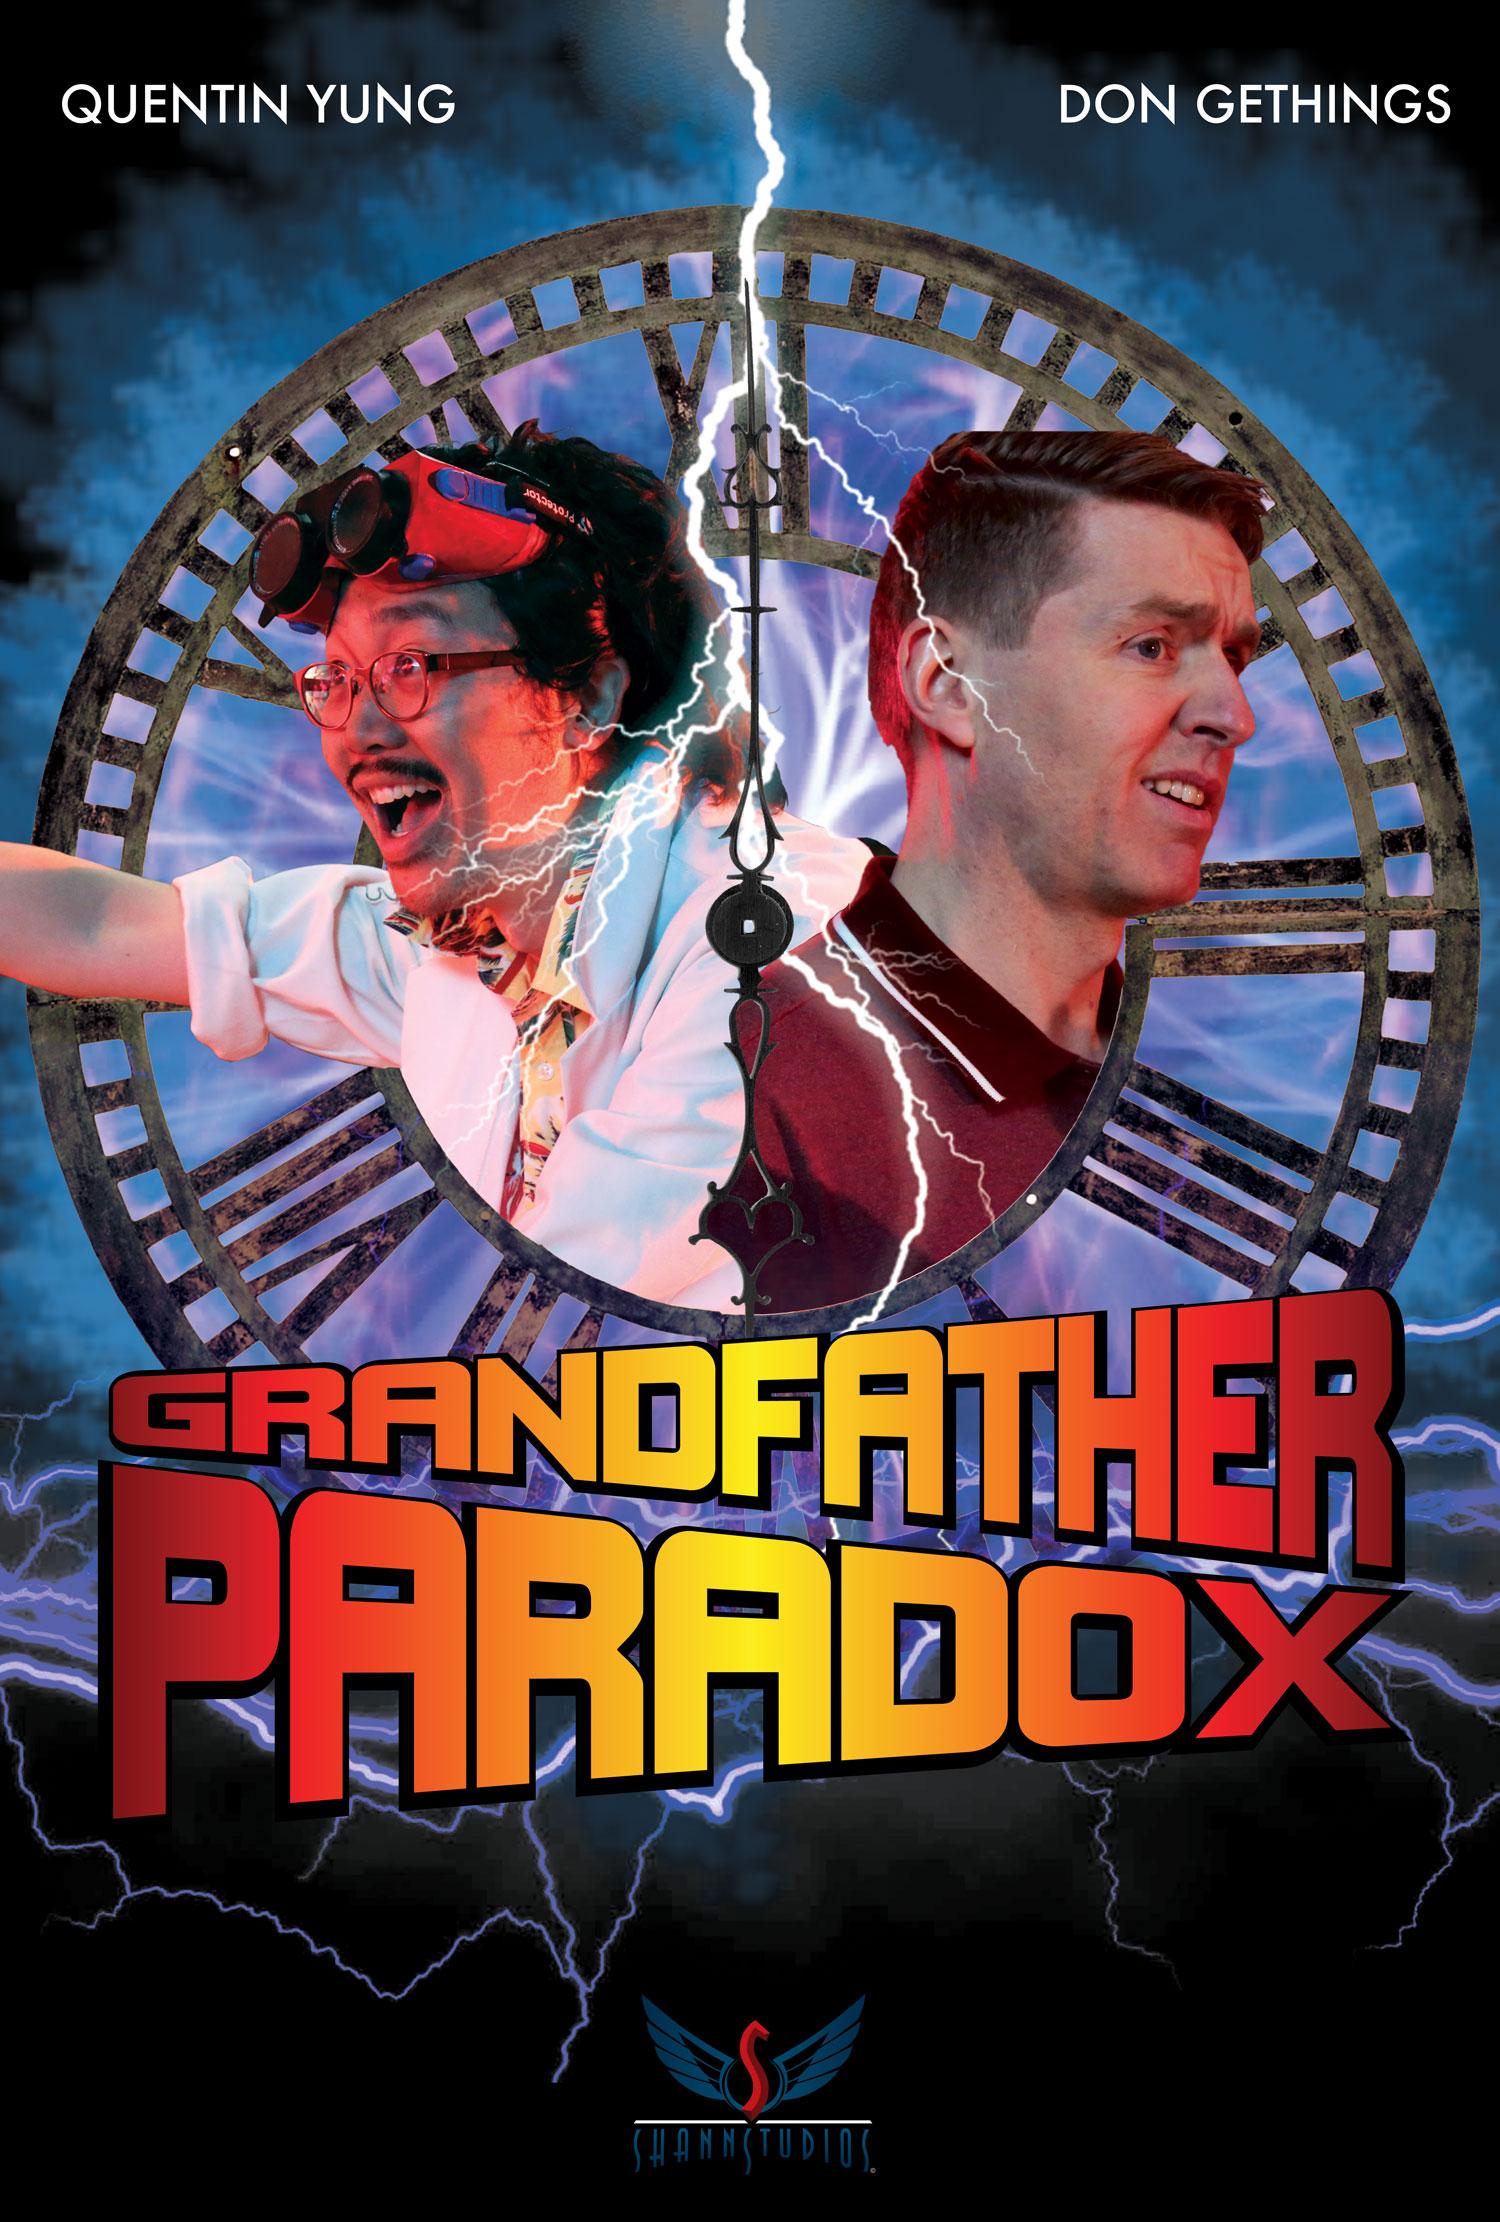 Grandfather Paradox (2014) - IMDb